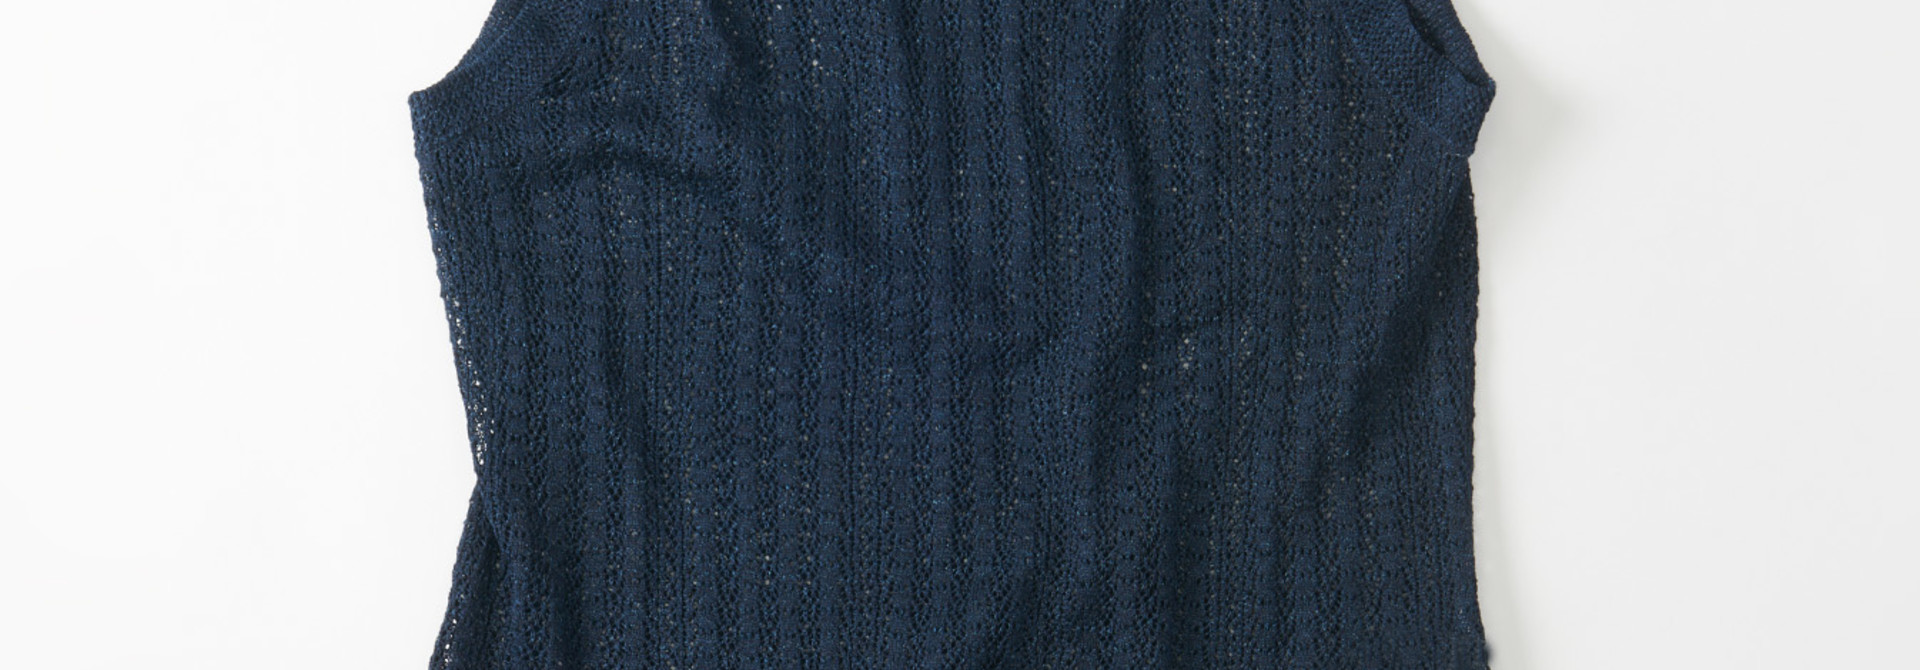 WH Indigo Gima Knit Lace Sleeveless Top